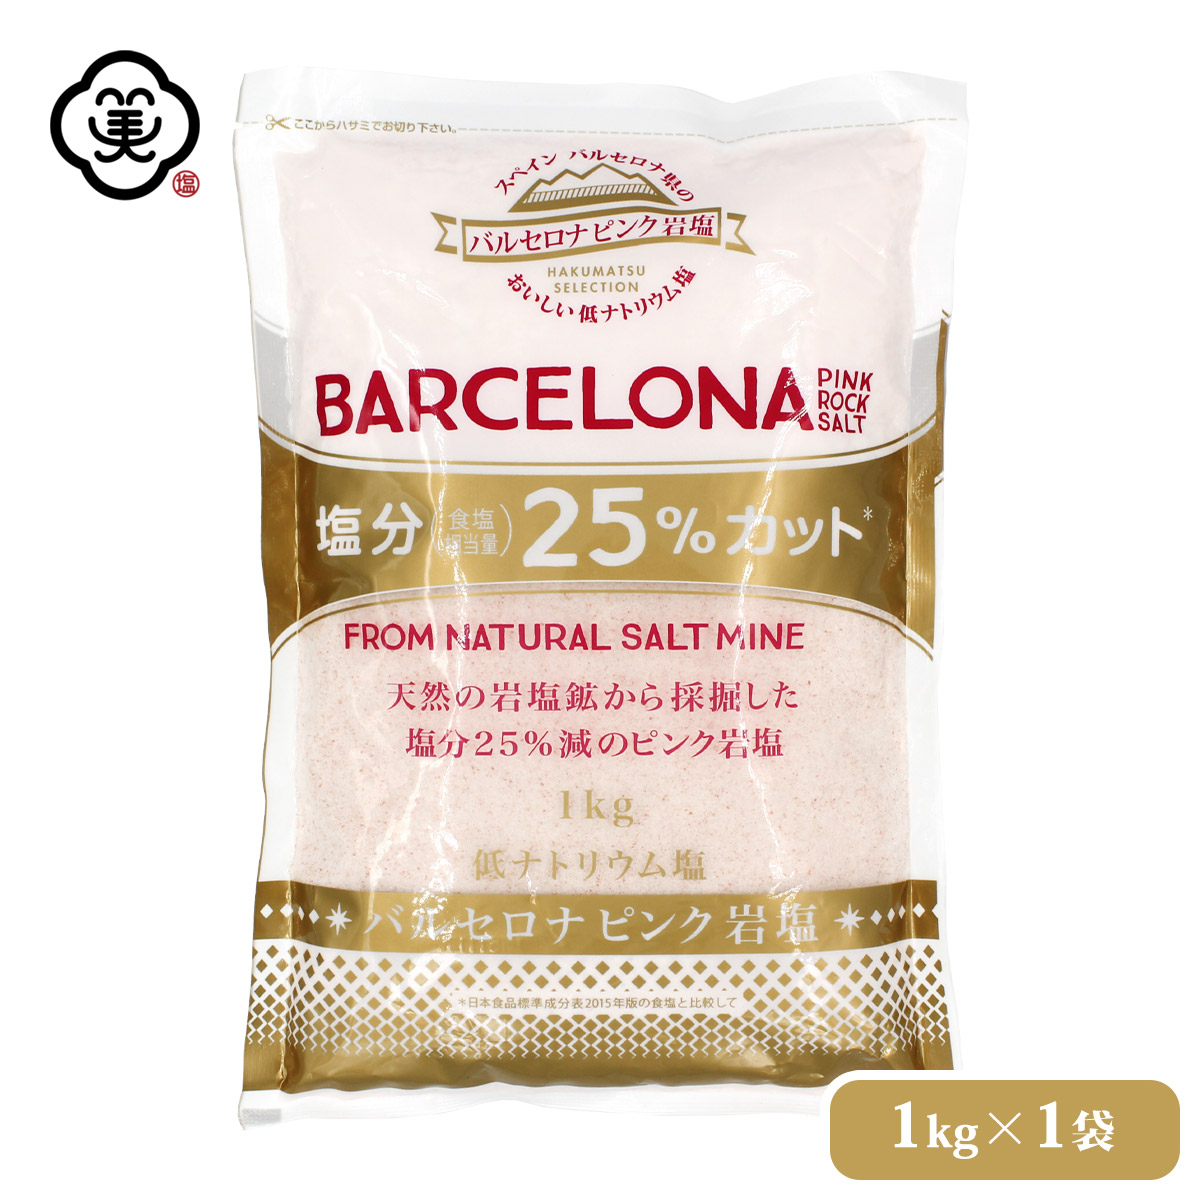 1kg×1袋 スペイン カタルーニャ 州 バルセロナで採掘された無添加の低ナトリウム塩 白松 バルセロナ ピンク岩塩 1kg × 1袋 さらさらタイプ 交換無料 塩分25%カット 返品送料無料 天然の岩塩鉱 低ナトリウム塩 食品添加物 お塩 海外産 採掘方岩塩 食塩 スペイン産 無添加 ピンクロックソルト 平袋 しお